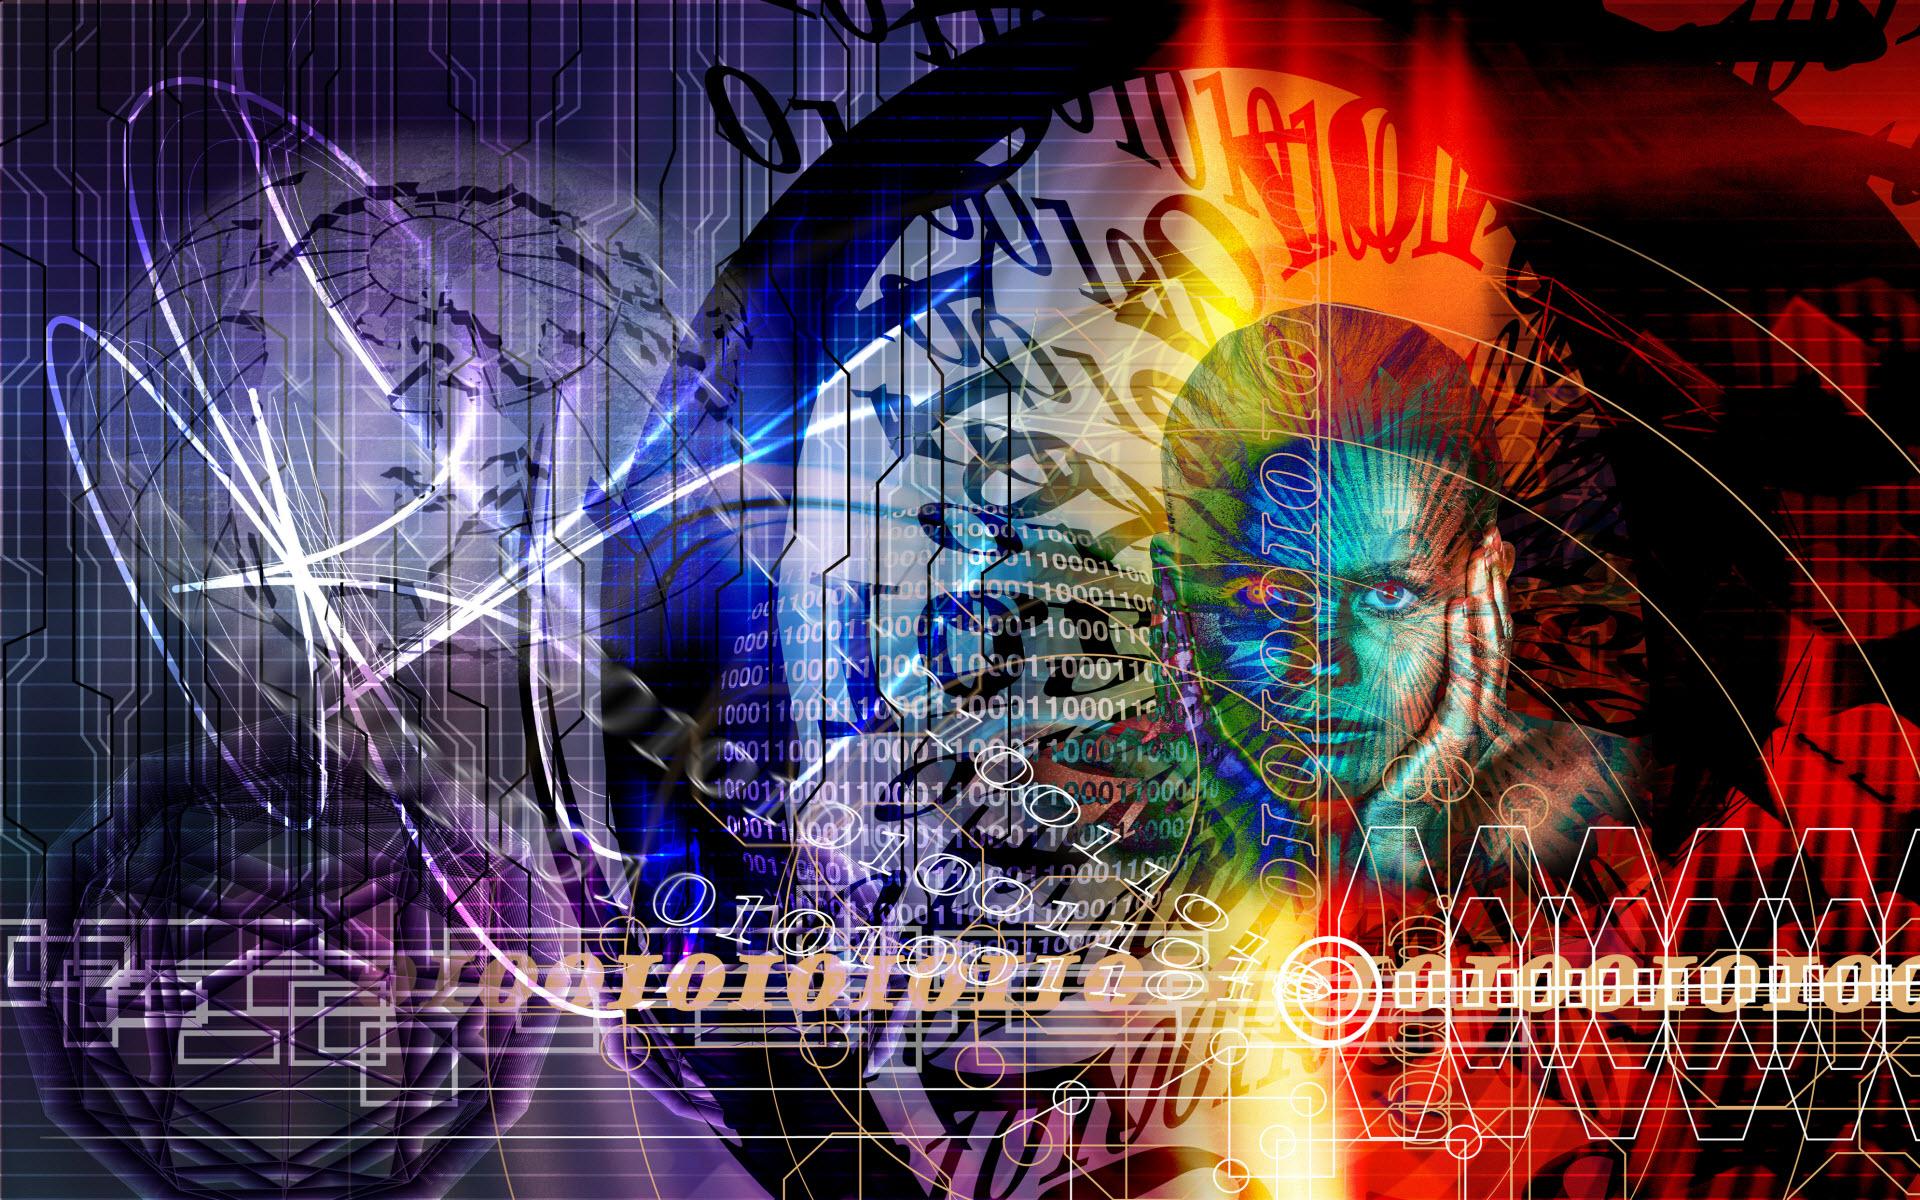 Alpha Coders Wallpaper Abyss Technologie Binary 88769 1920x1200